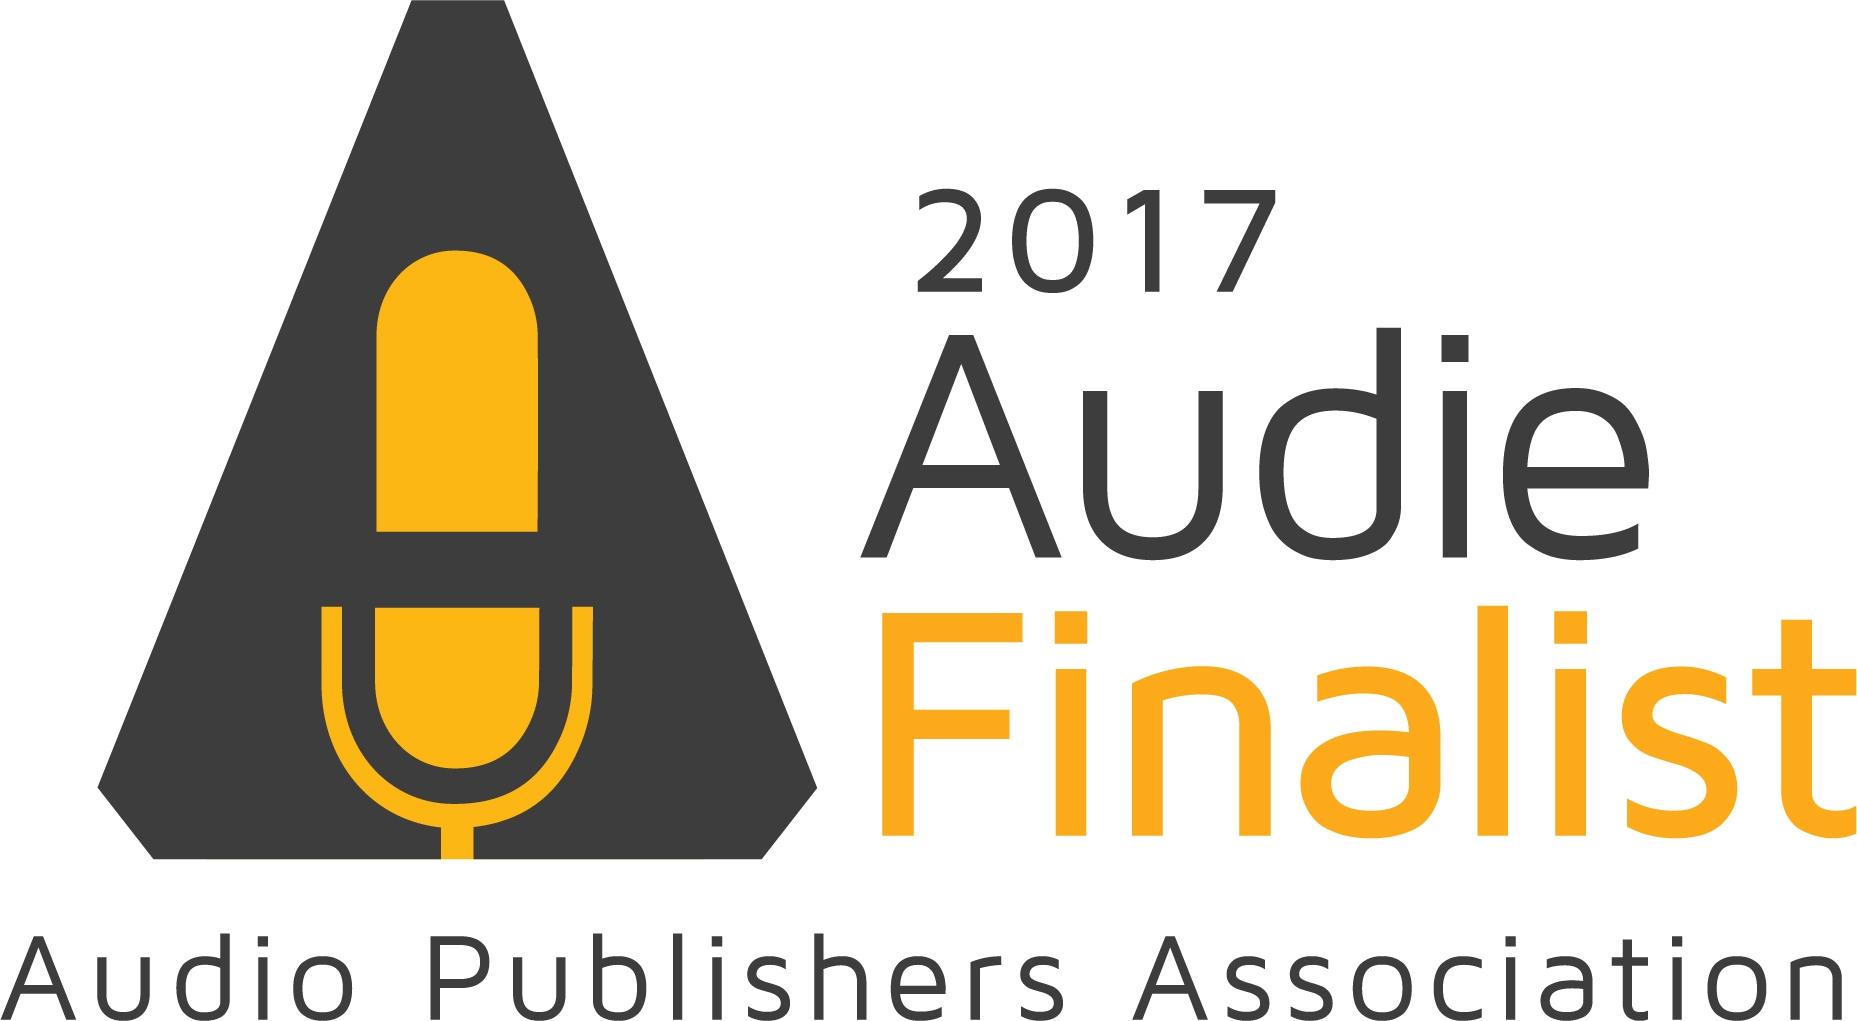 http://www.audiofilemagazine.com/audies/?category=Fiction&winners=false